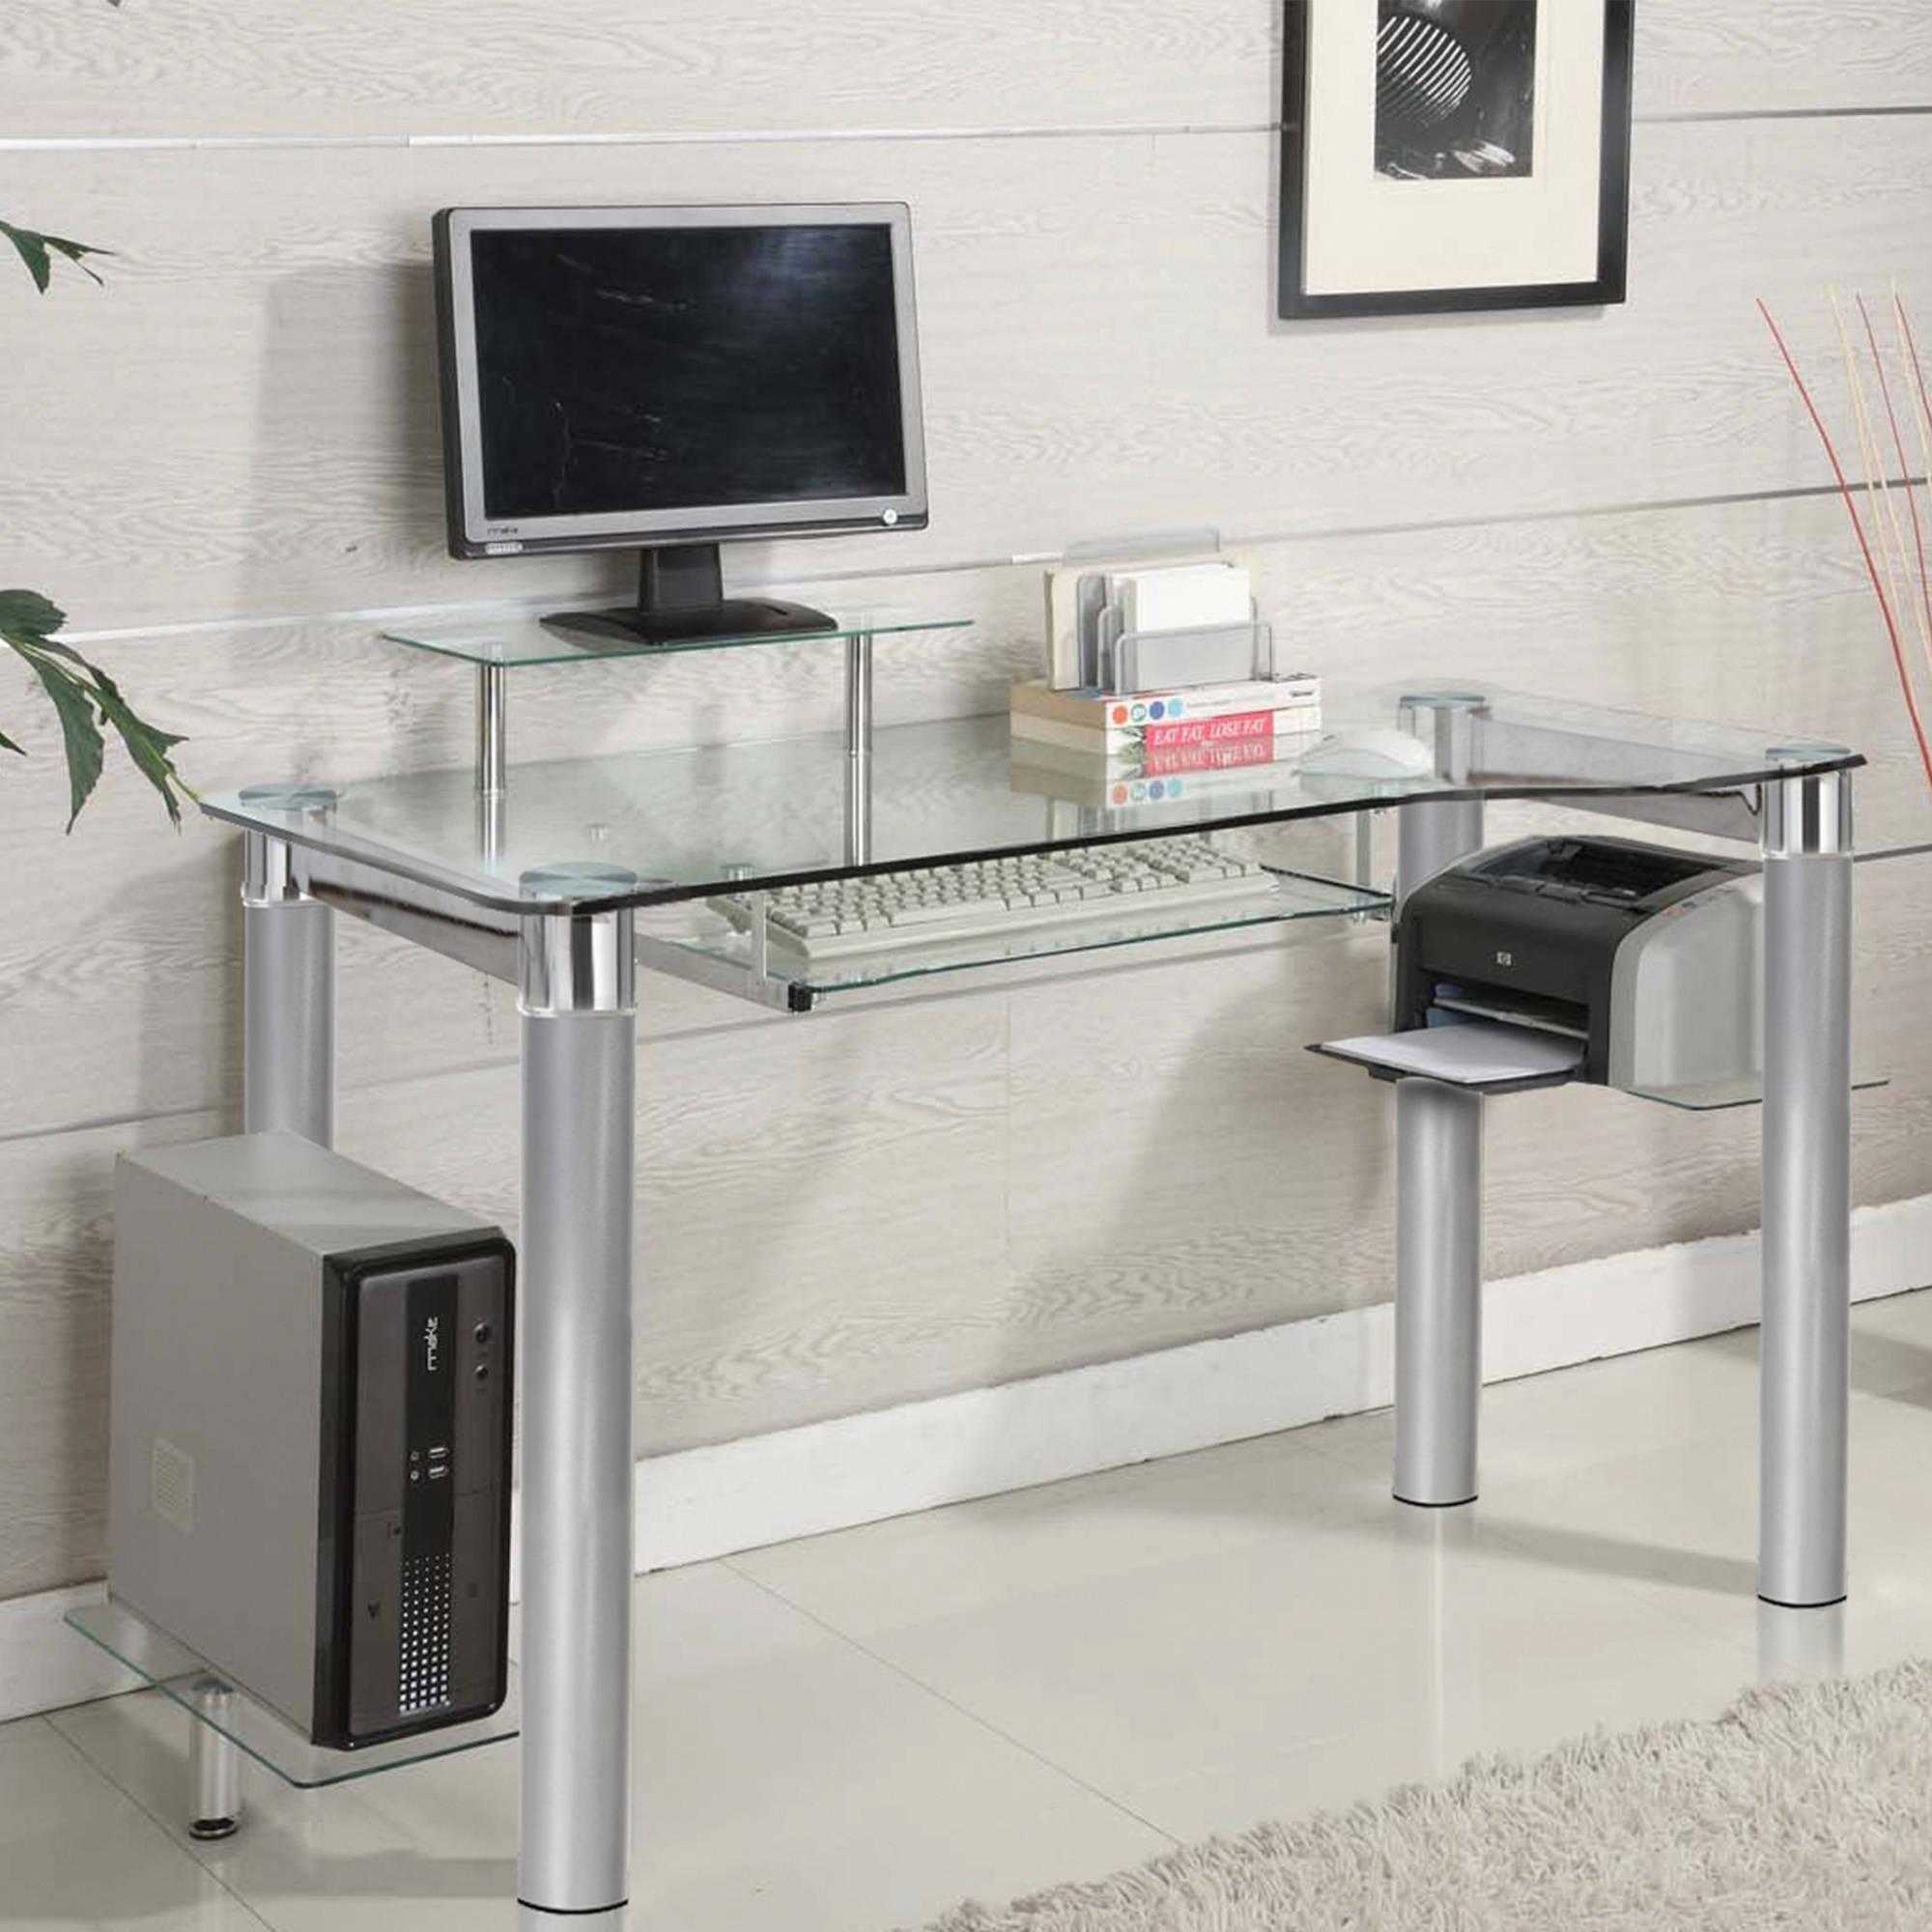 Glass desk innovex clear tempered glass modern style saturn desk - walmart.com GKFCNWH